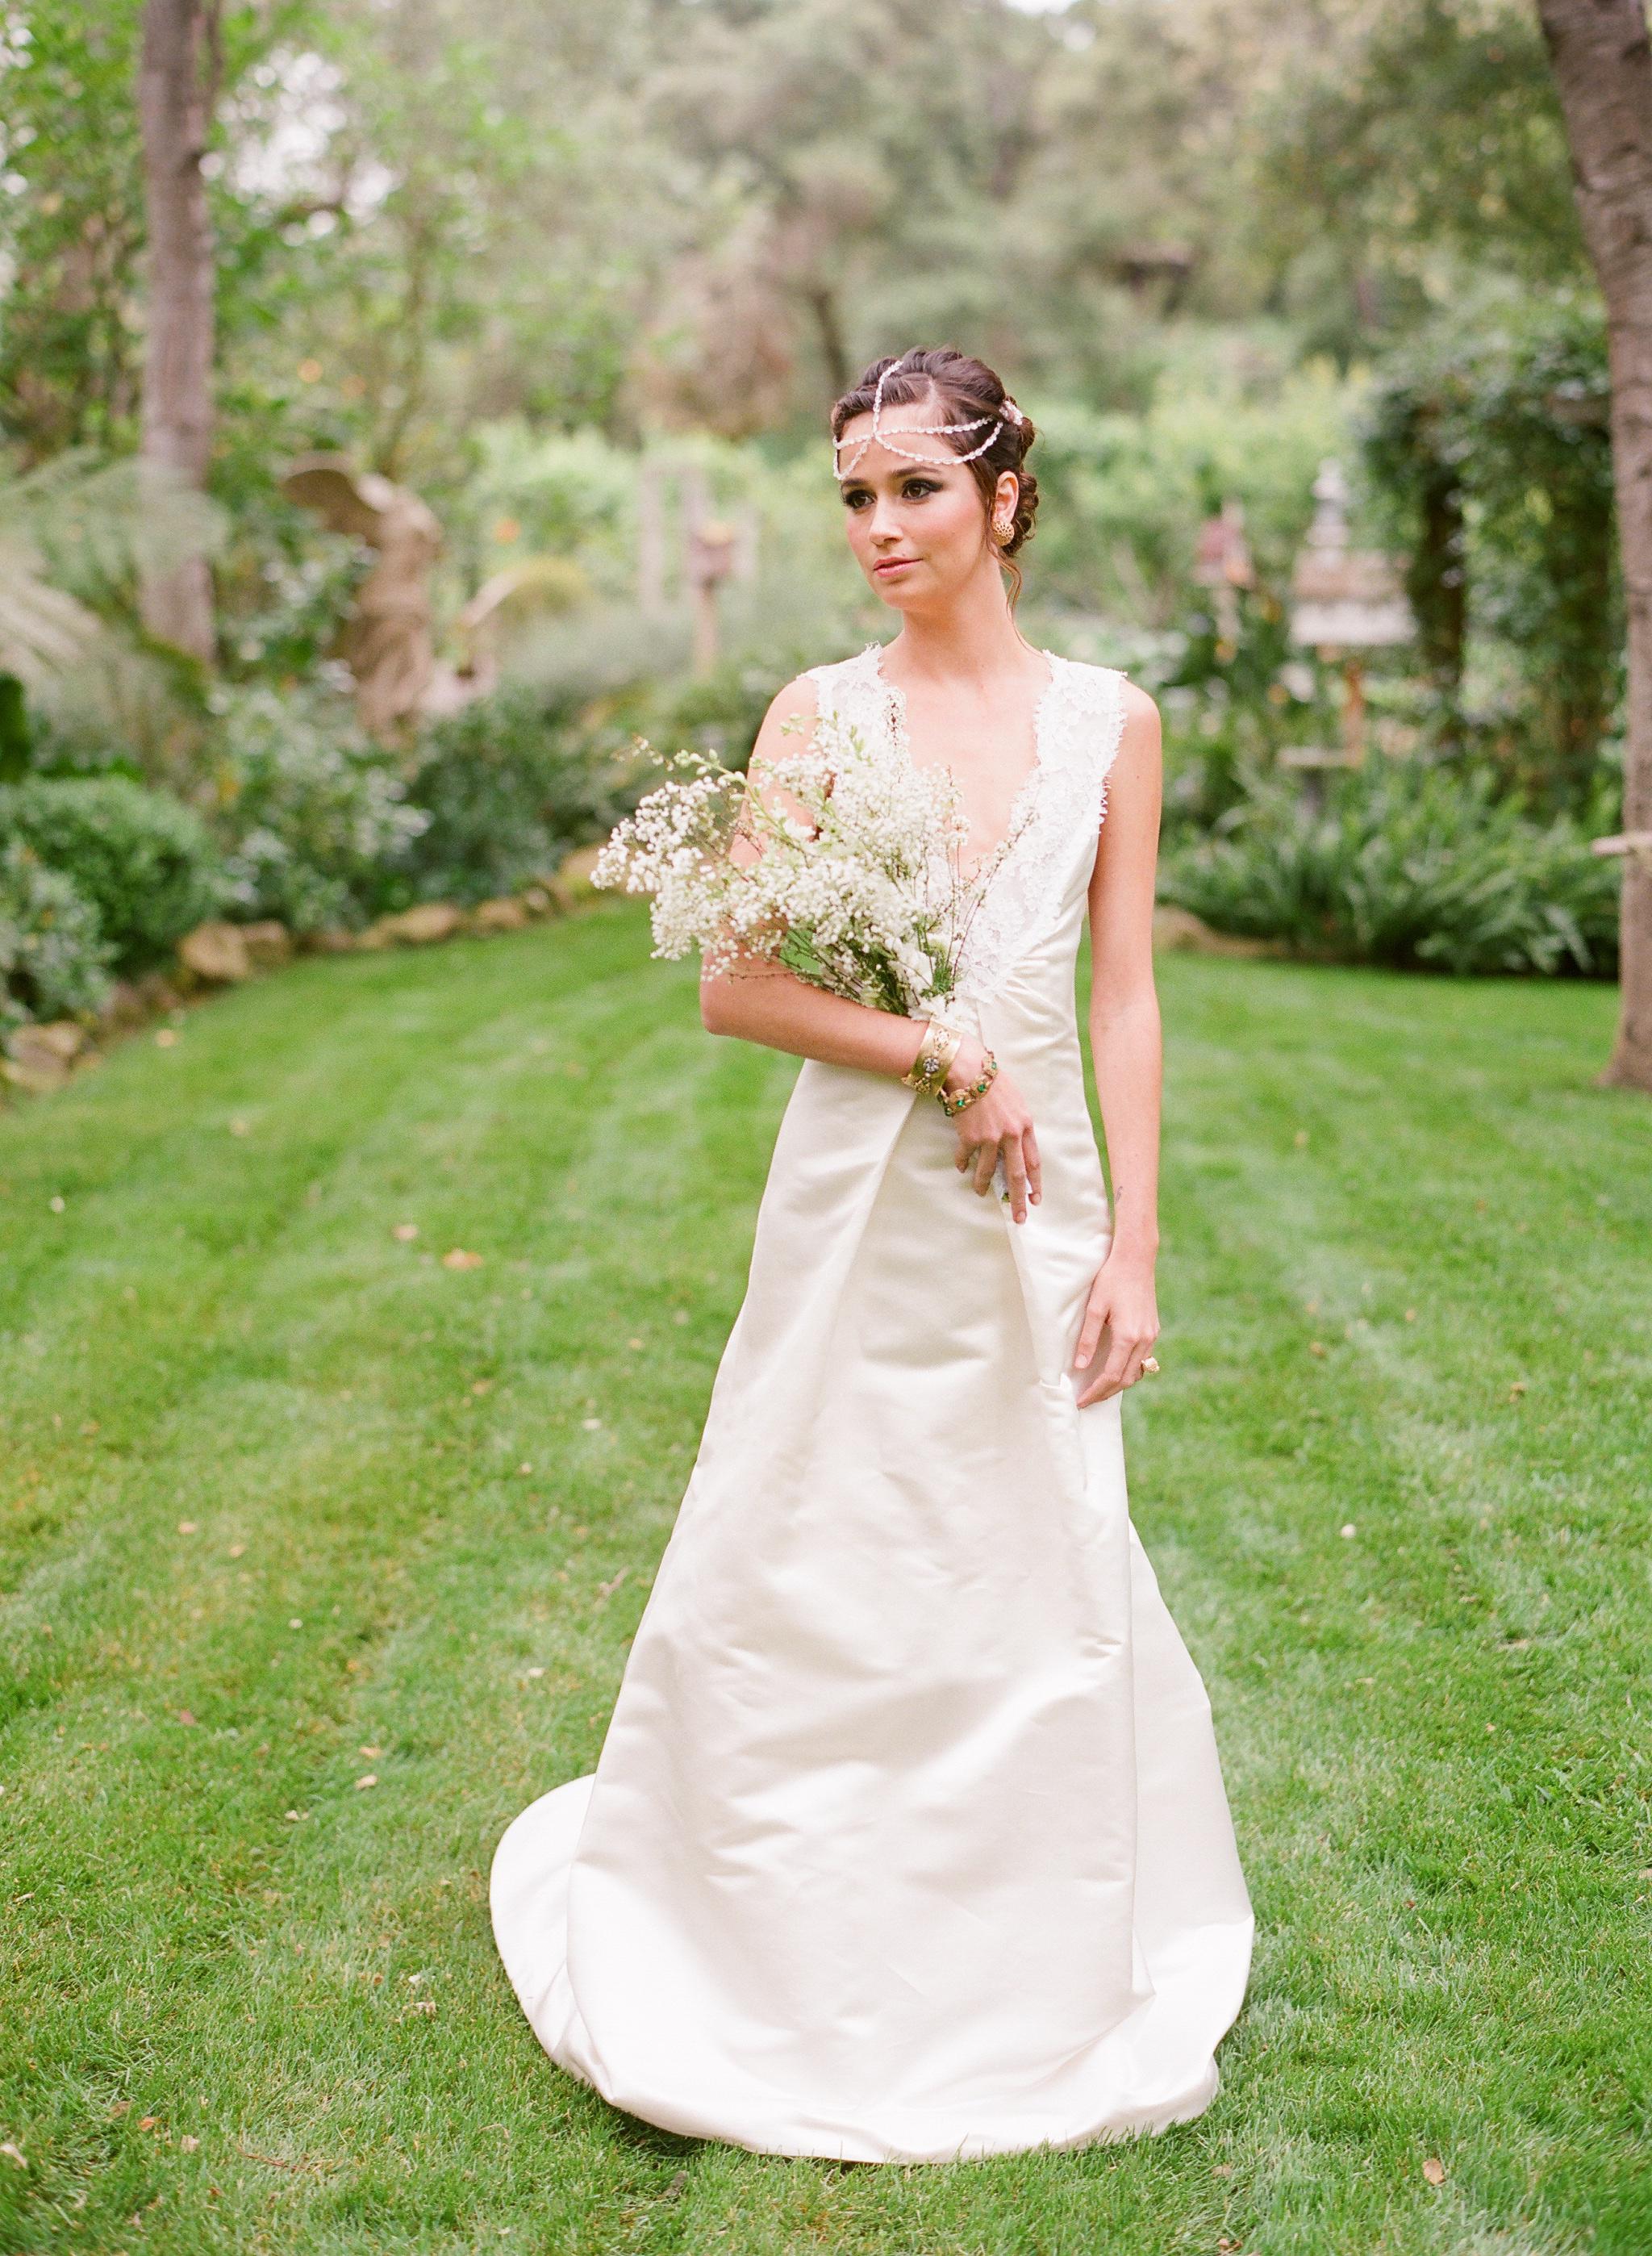 Wedding Dress Lace Italian : Italian bohemian wedding bride dress lace bouquet original